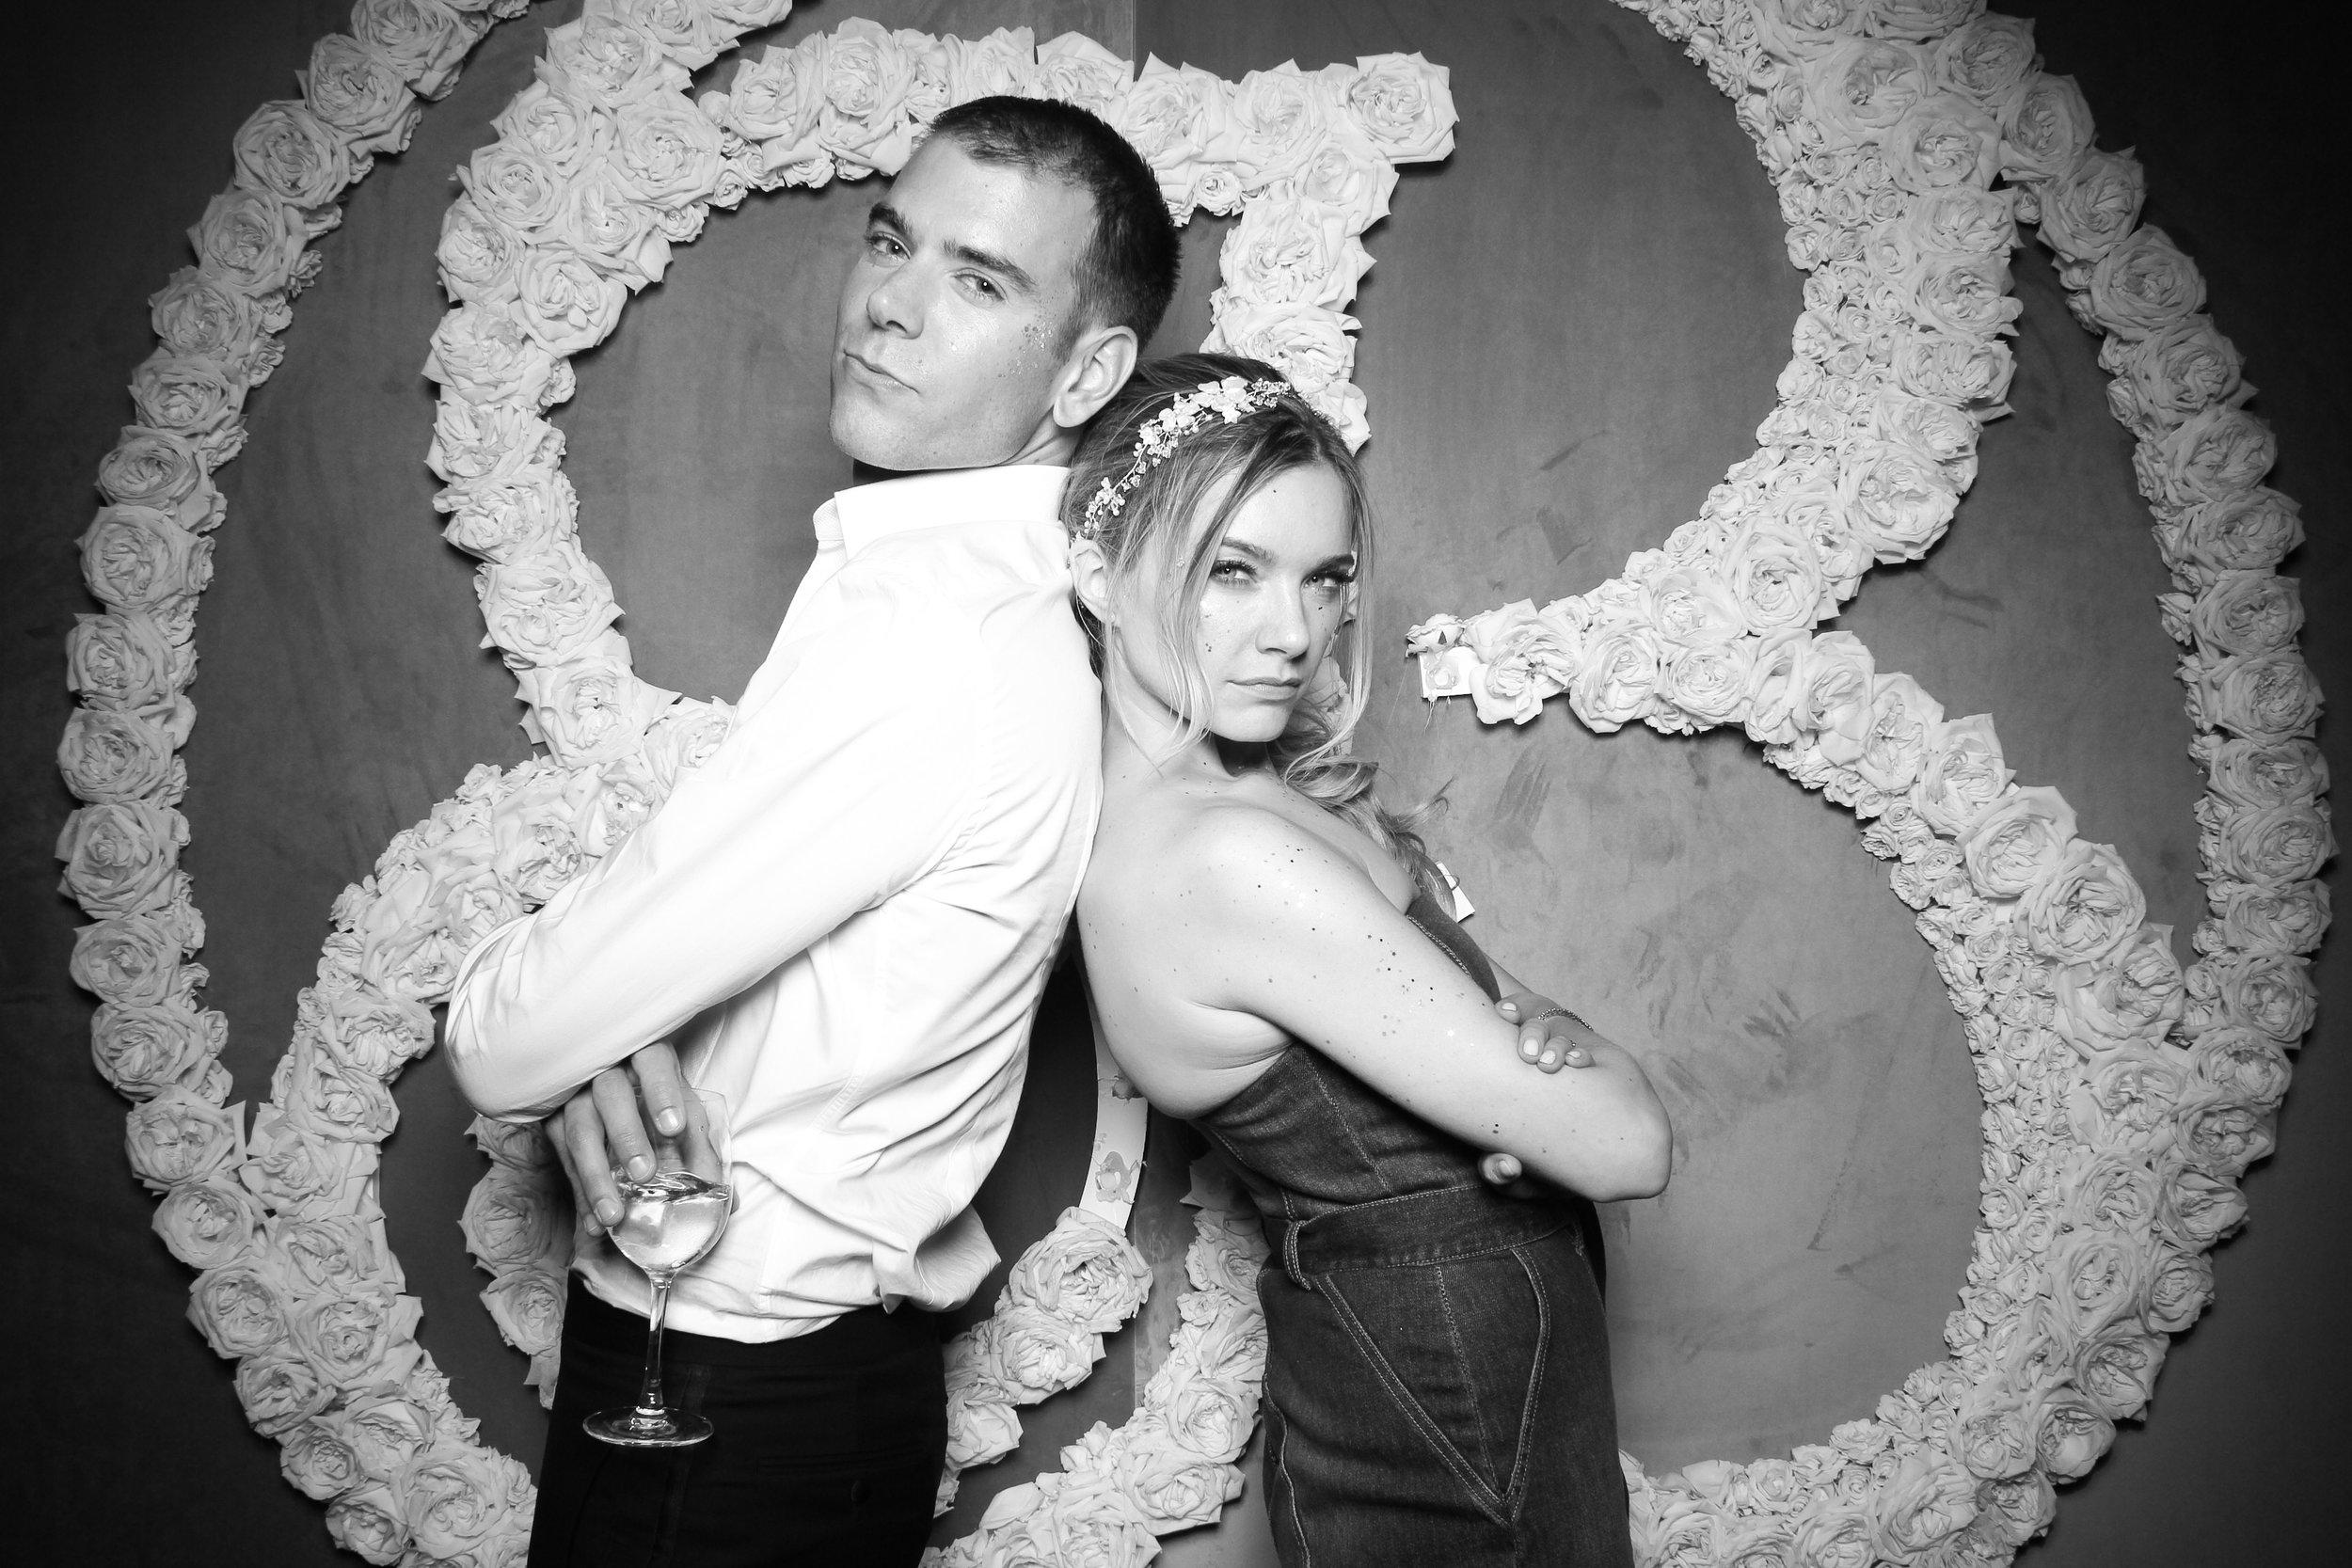 Photo_Booth_Rental_At_Standard_Club_Wedding_Chicago_21.jpg